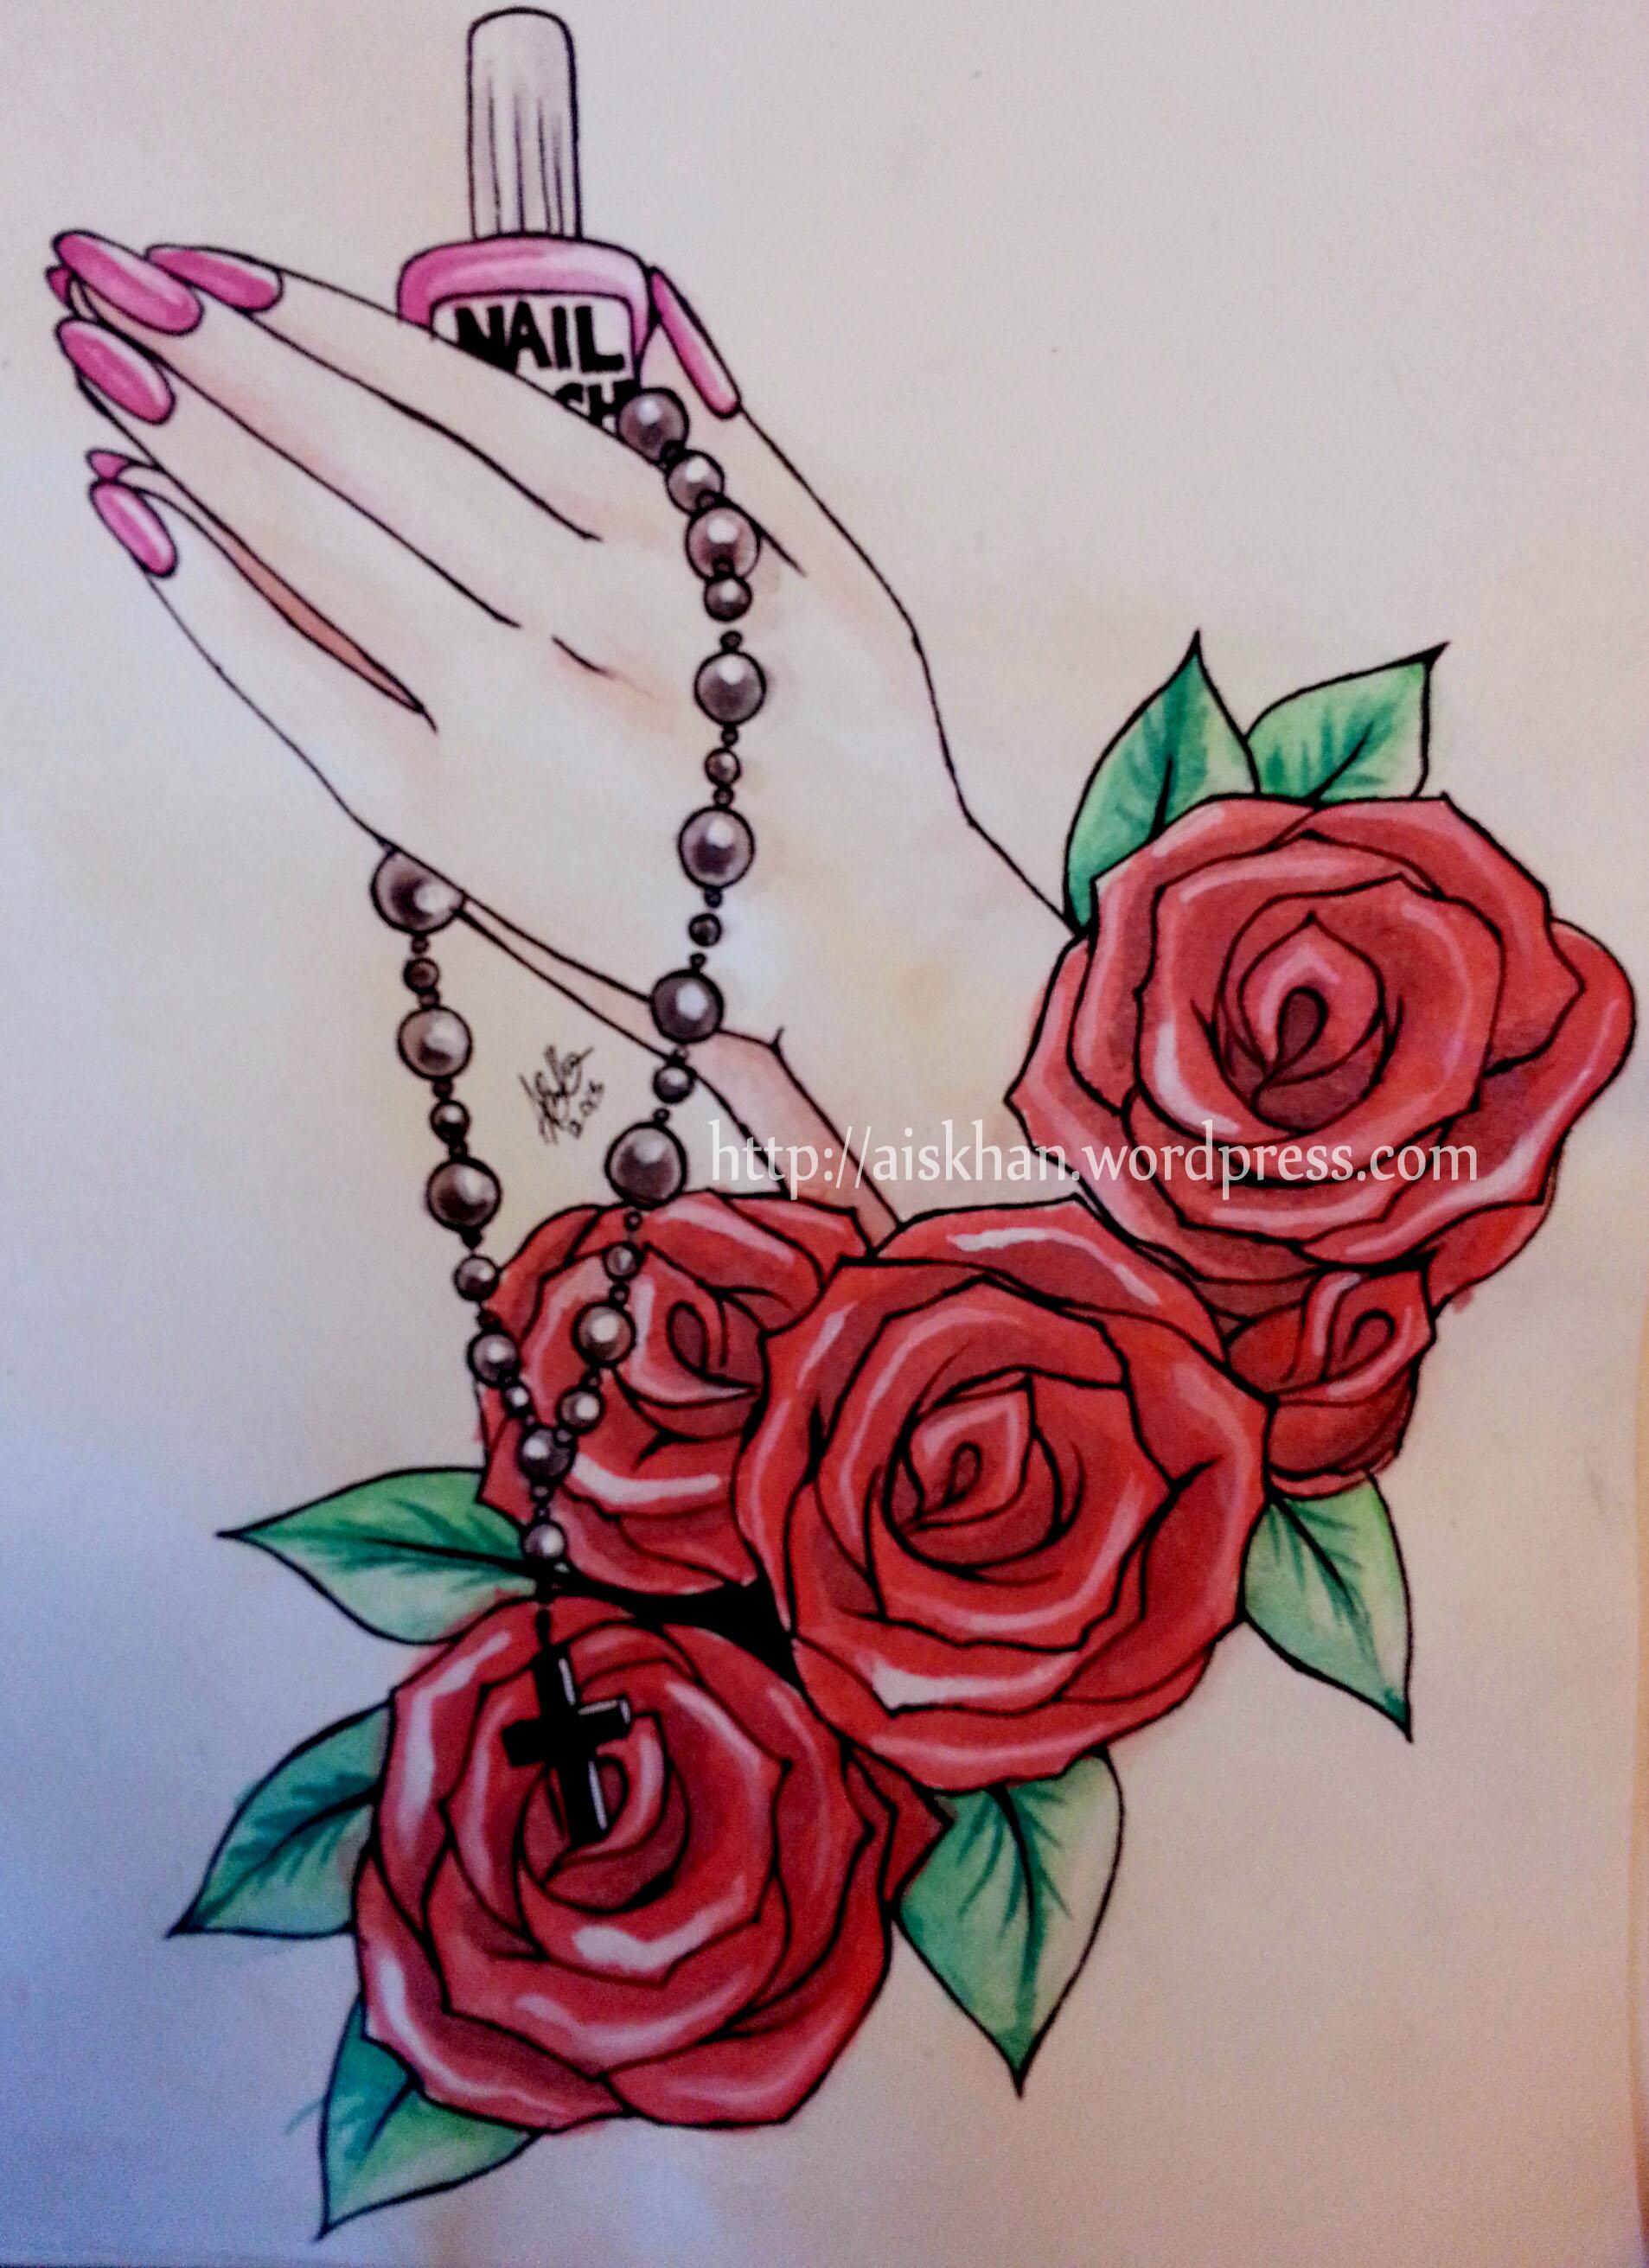 Praying Hands Tattoo Design – Ayesha KhanPraying Hands Drawing With Rose